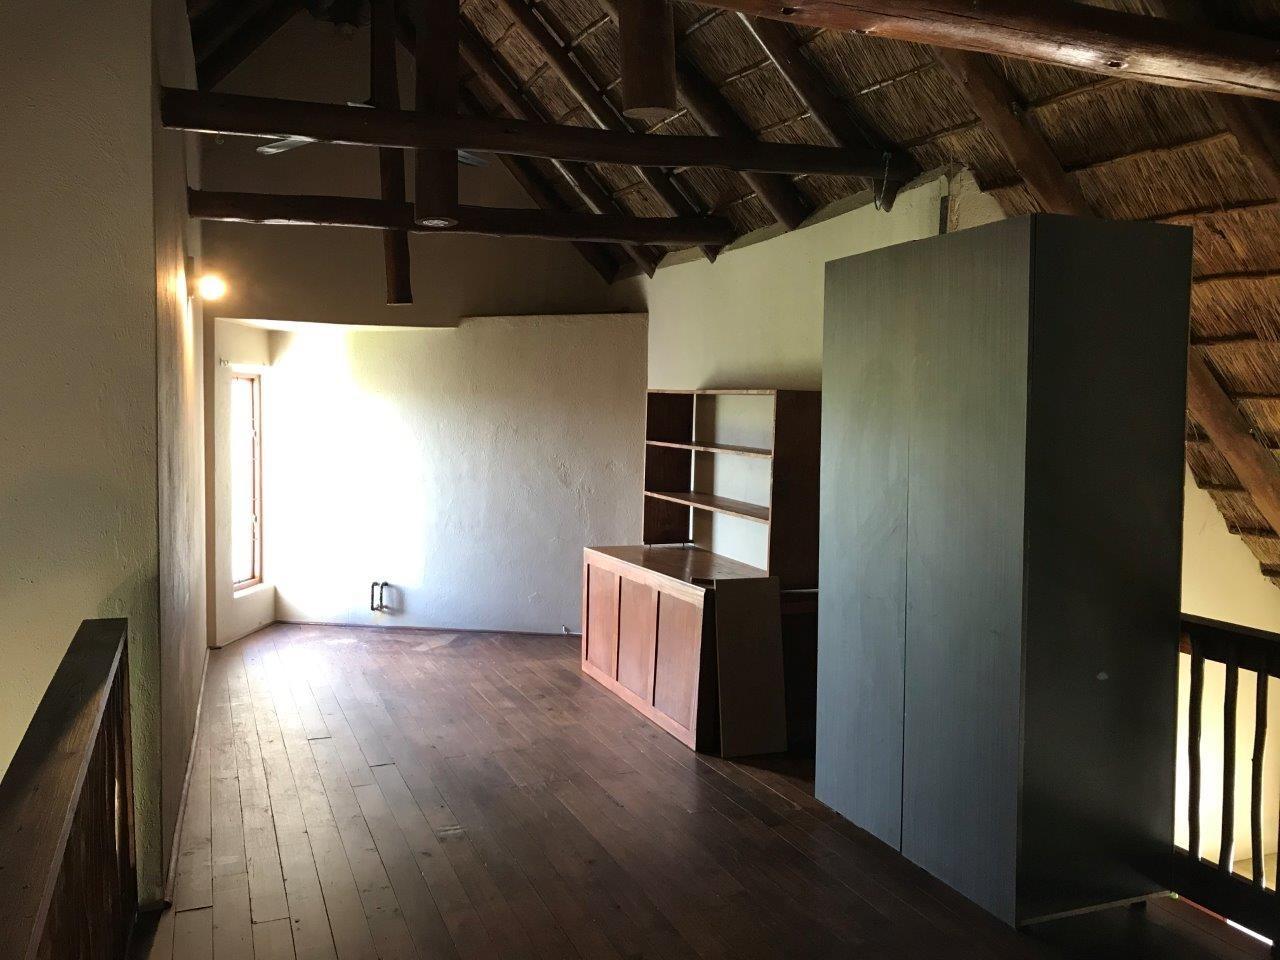 2 Bedroom Apartment / Flat For Sale in Hoedspruit